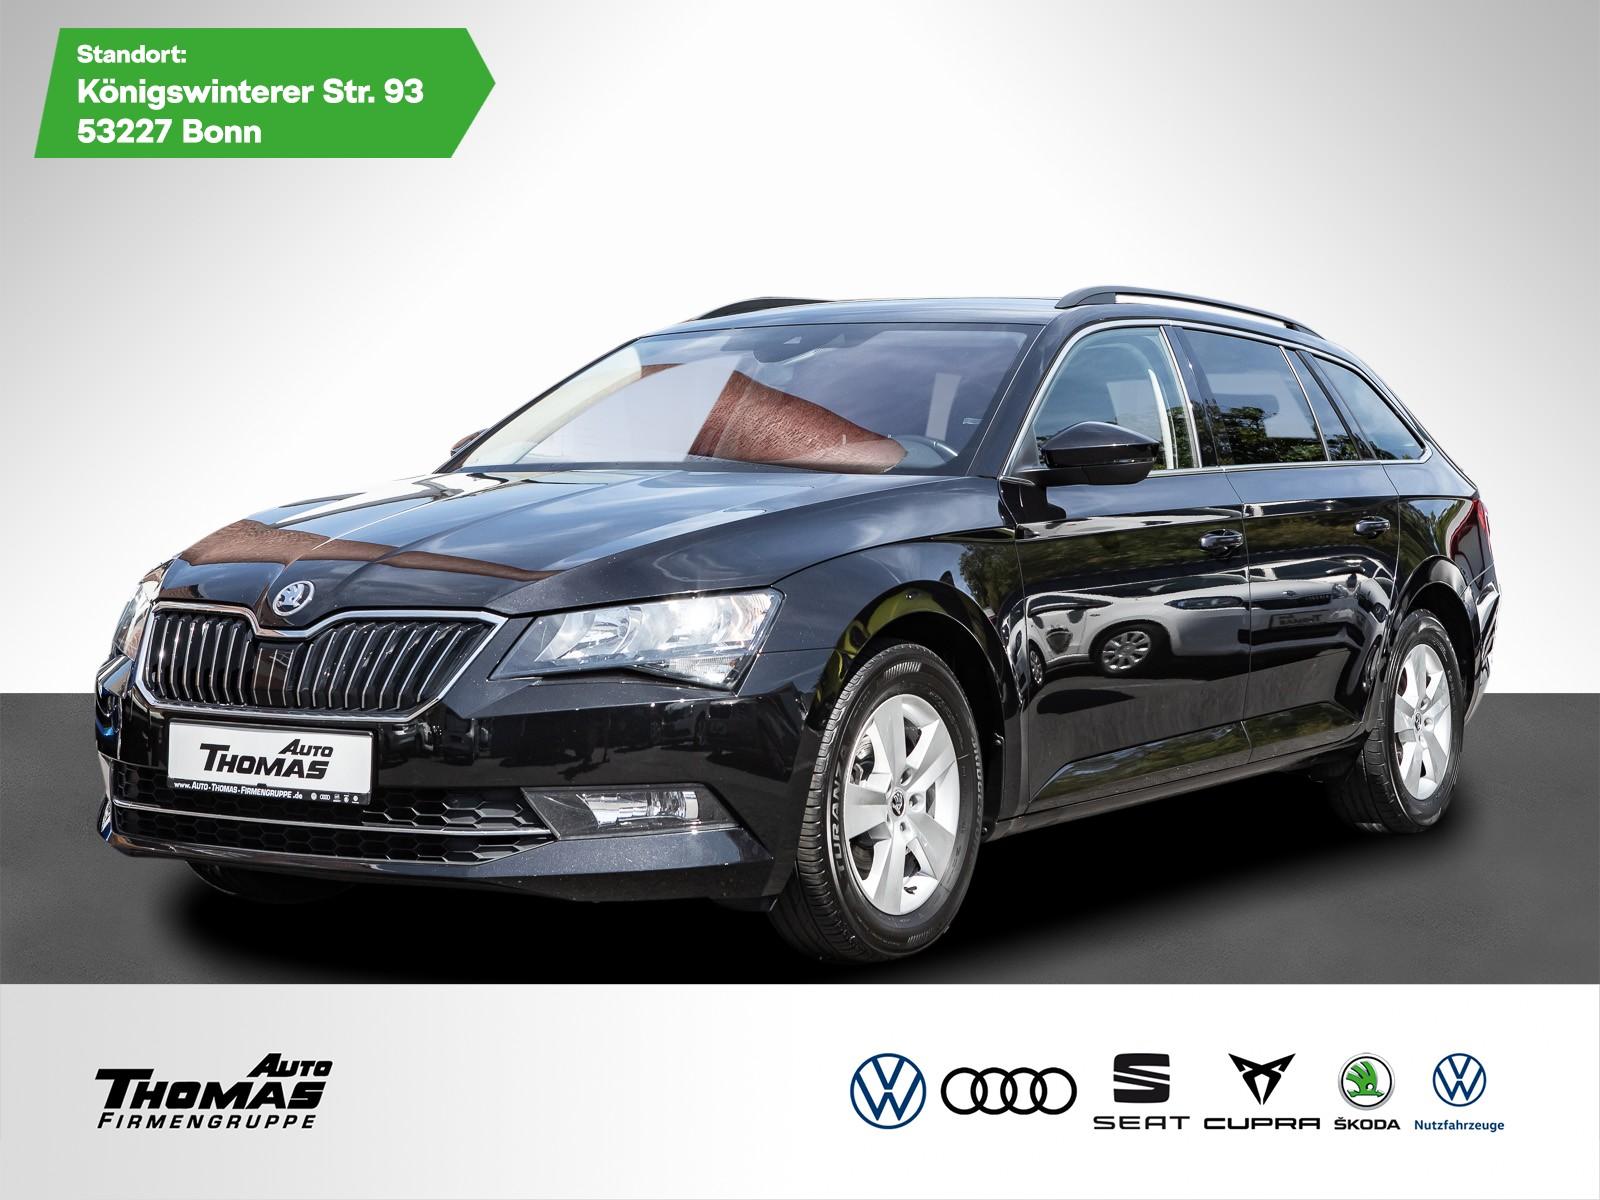 Skoda Superb III Combi Ambition 2.0 TDI DSG *NAVI*AHK*, Jahr 2017, Diesel